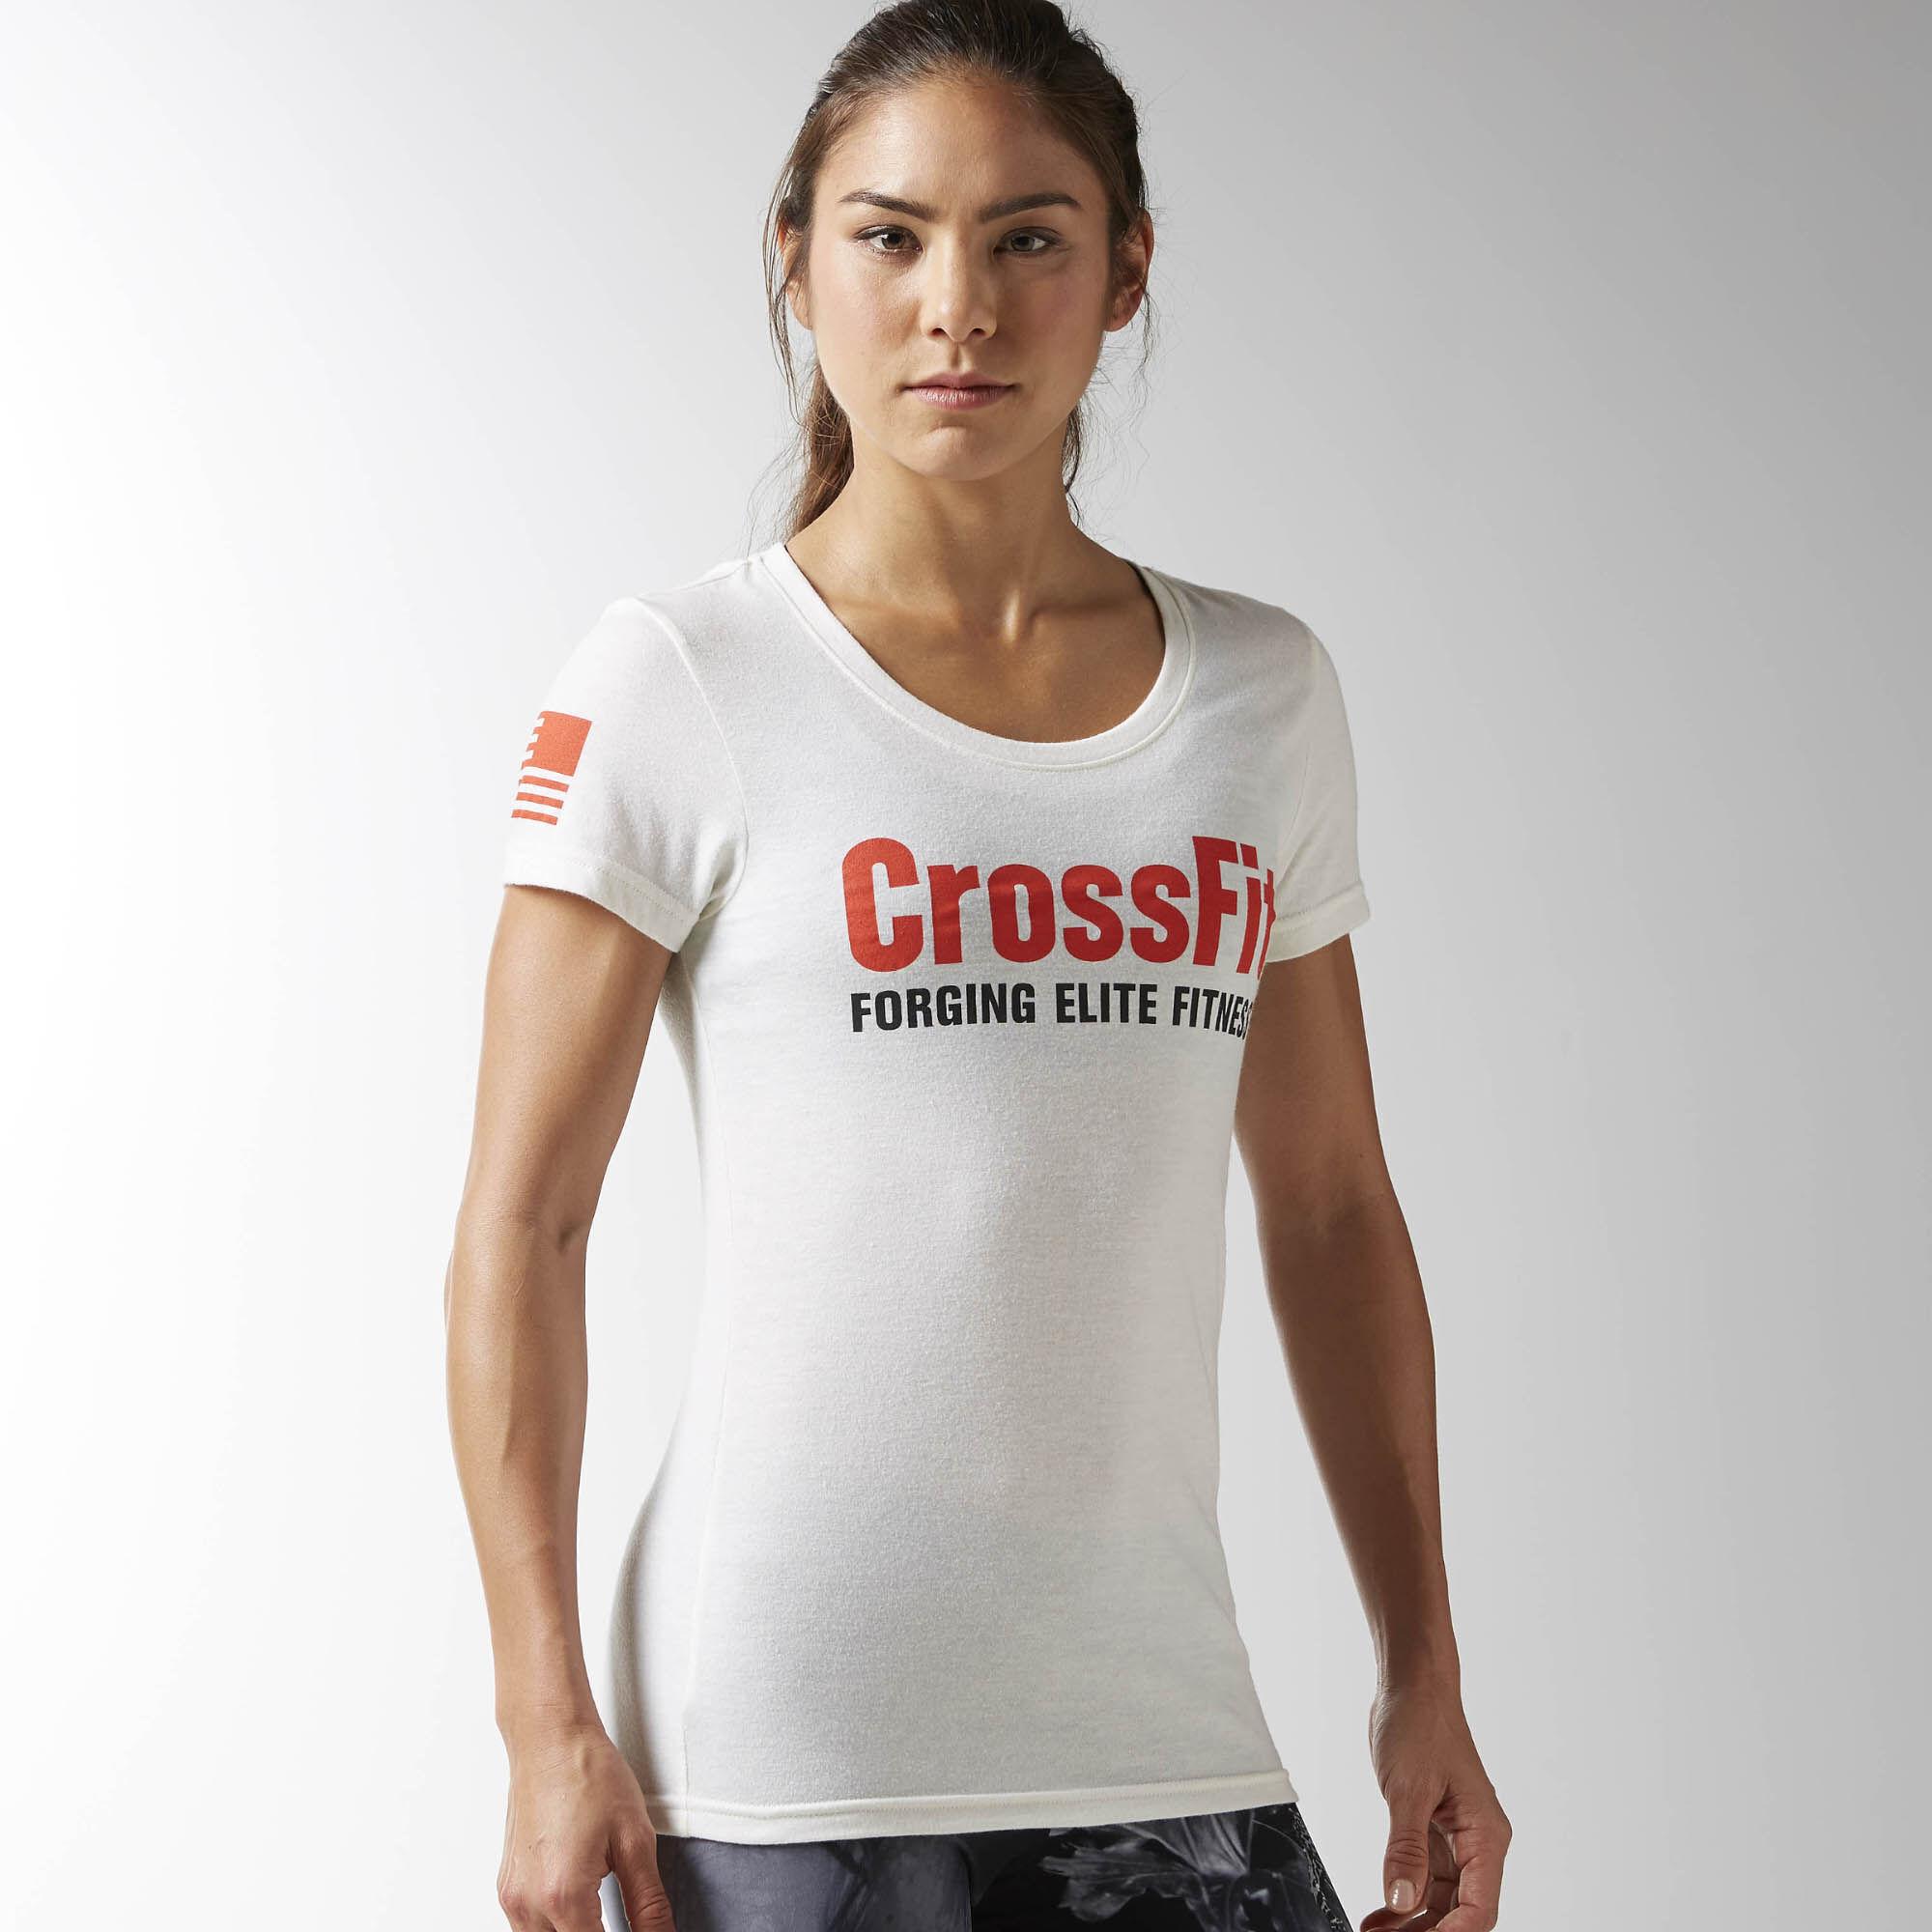 reebok australia crossfit gym